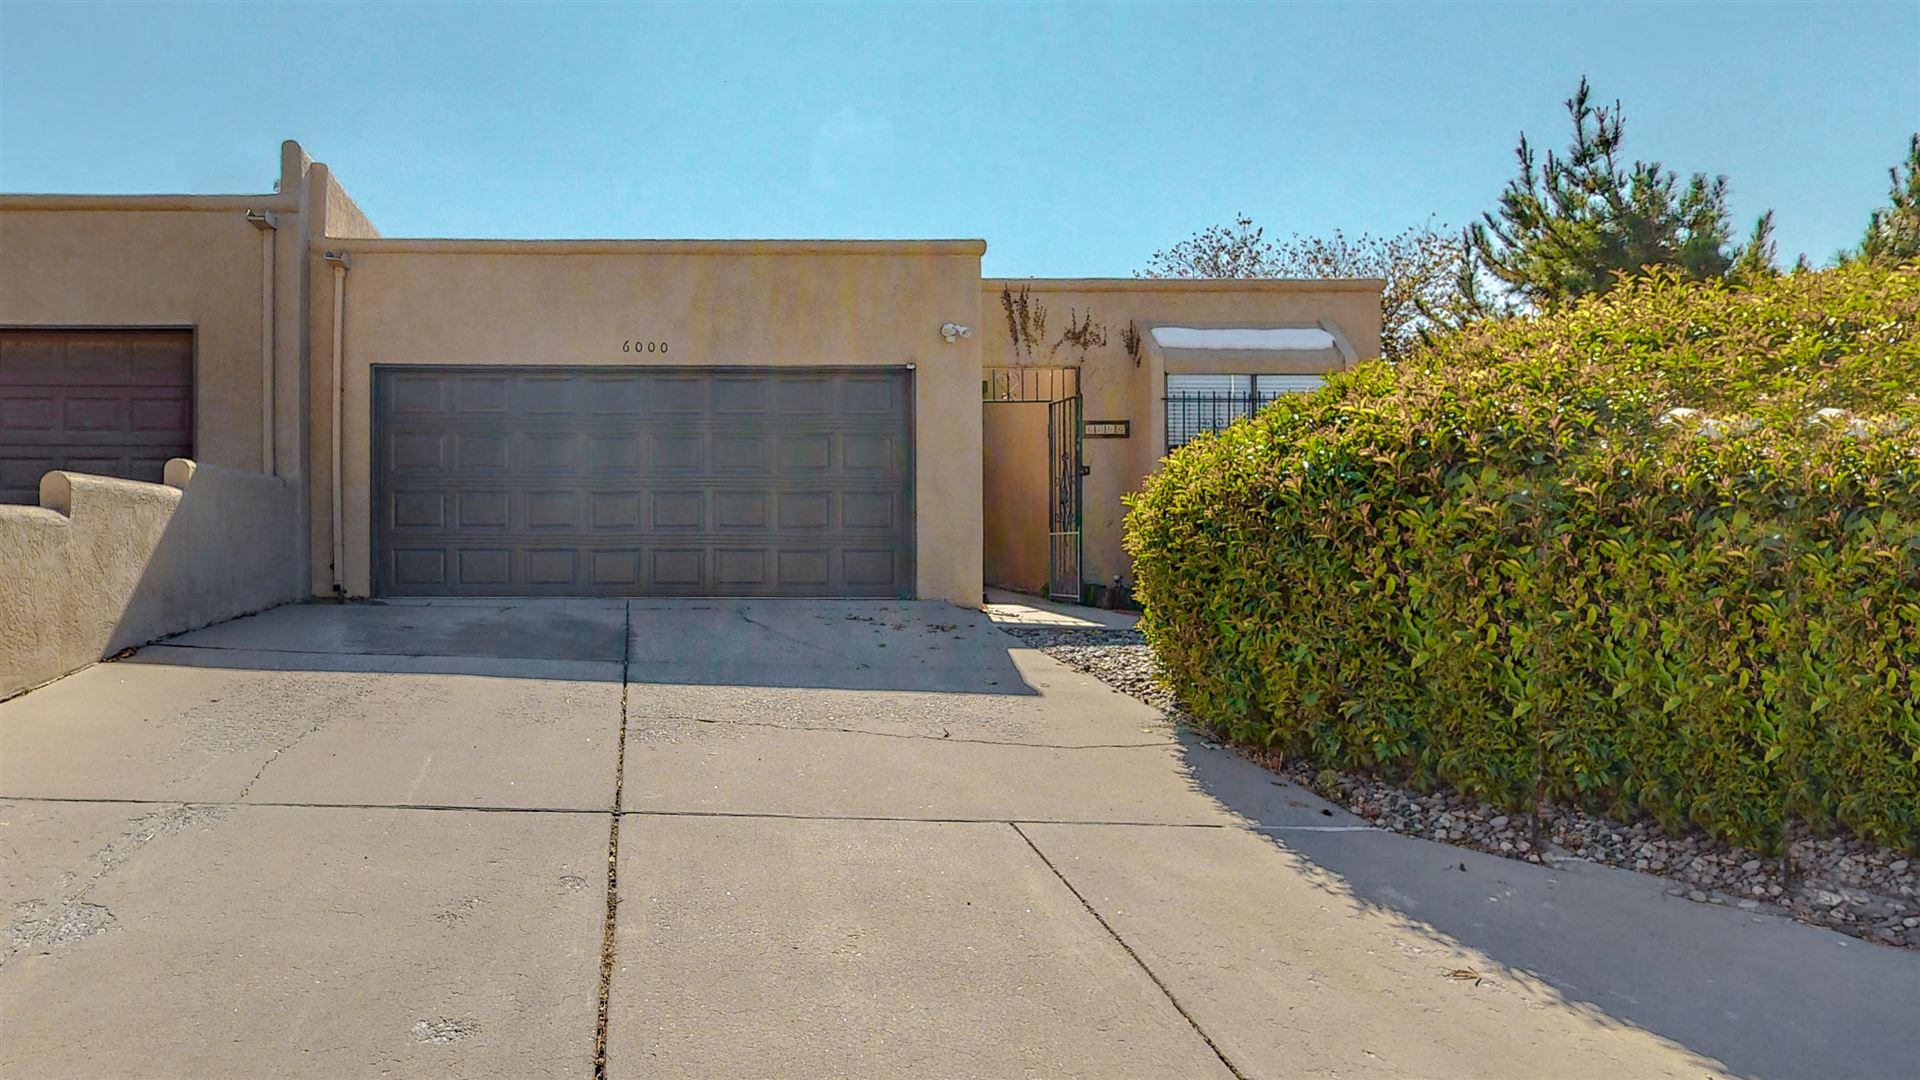 6000 KATSON Avenue NE, Albuquerque, NM 87109 - MLS#: 980133